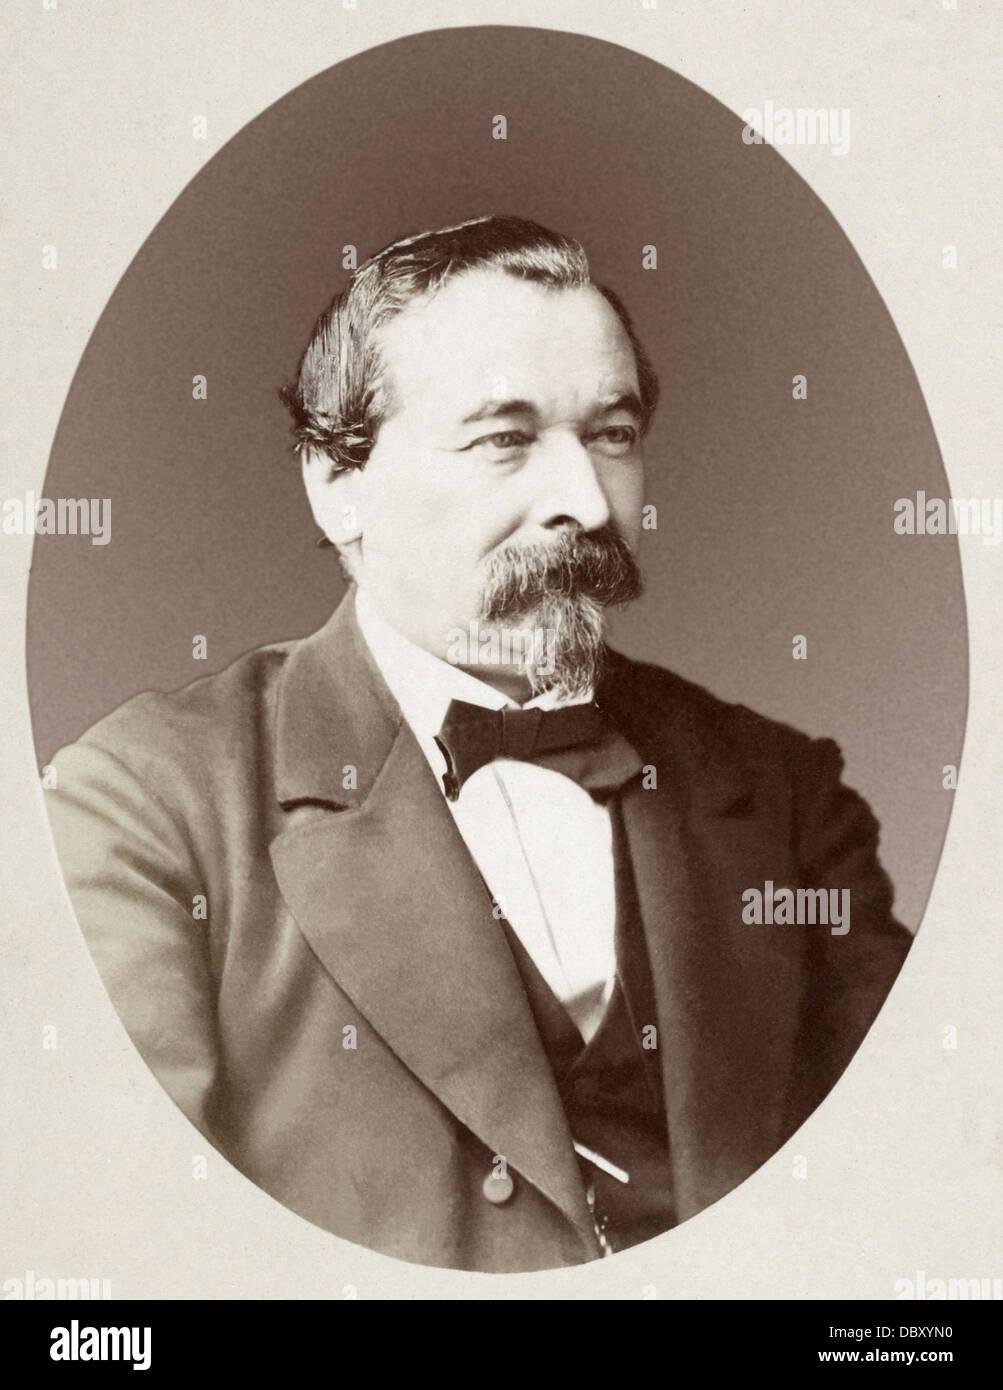 Georges Erhard Schieble (1823 - 1880), francese cartografo ed incisore. Immagini Stock